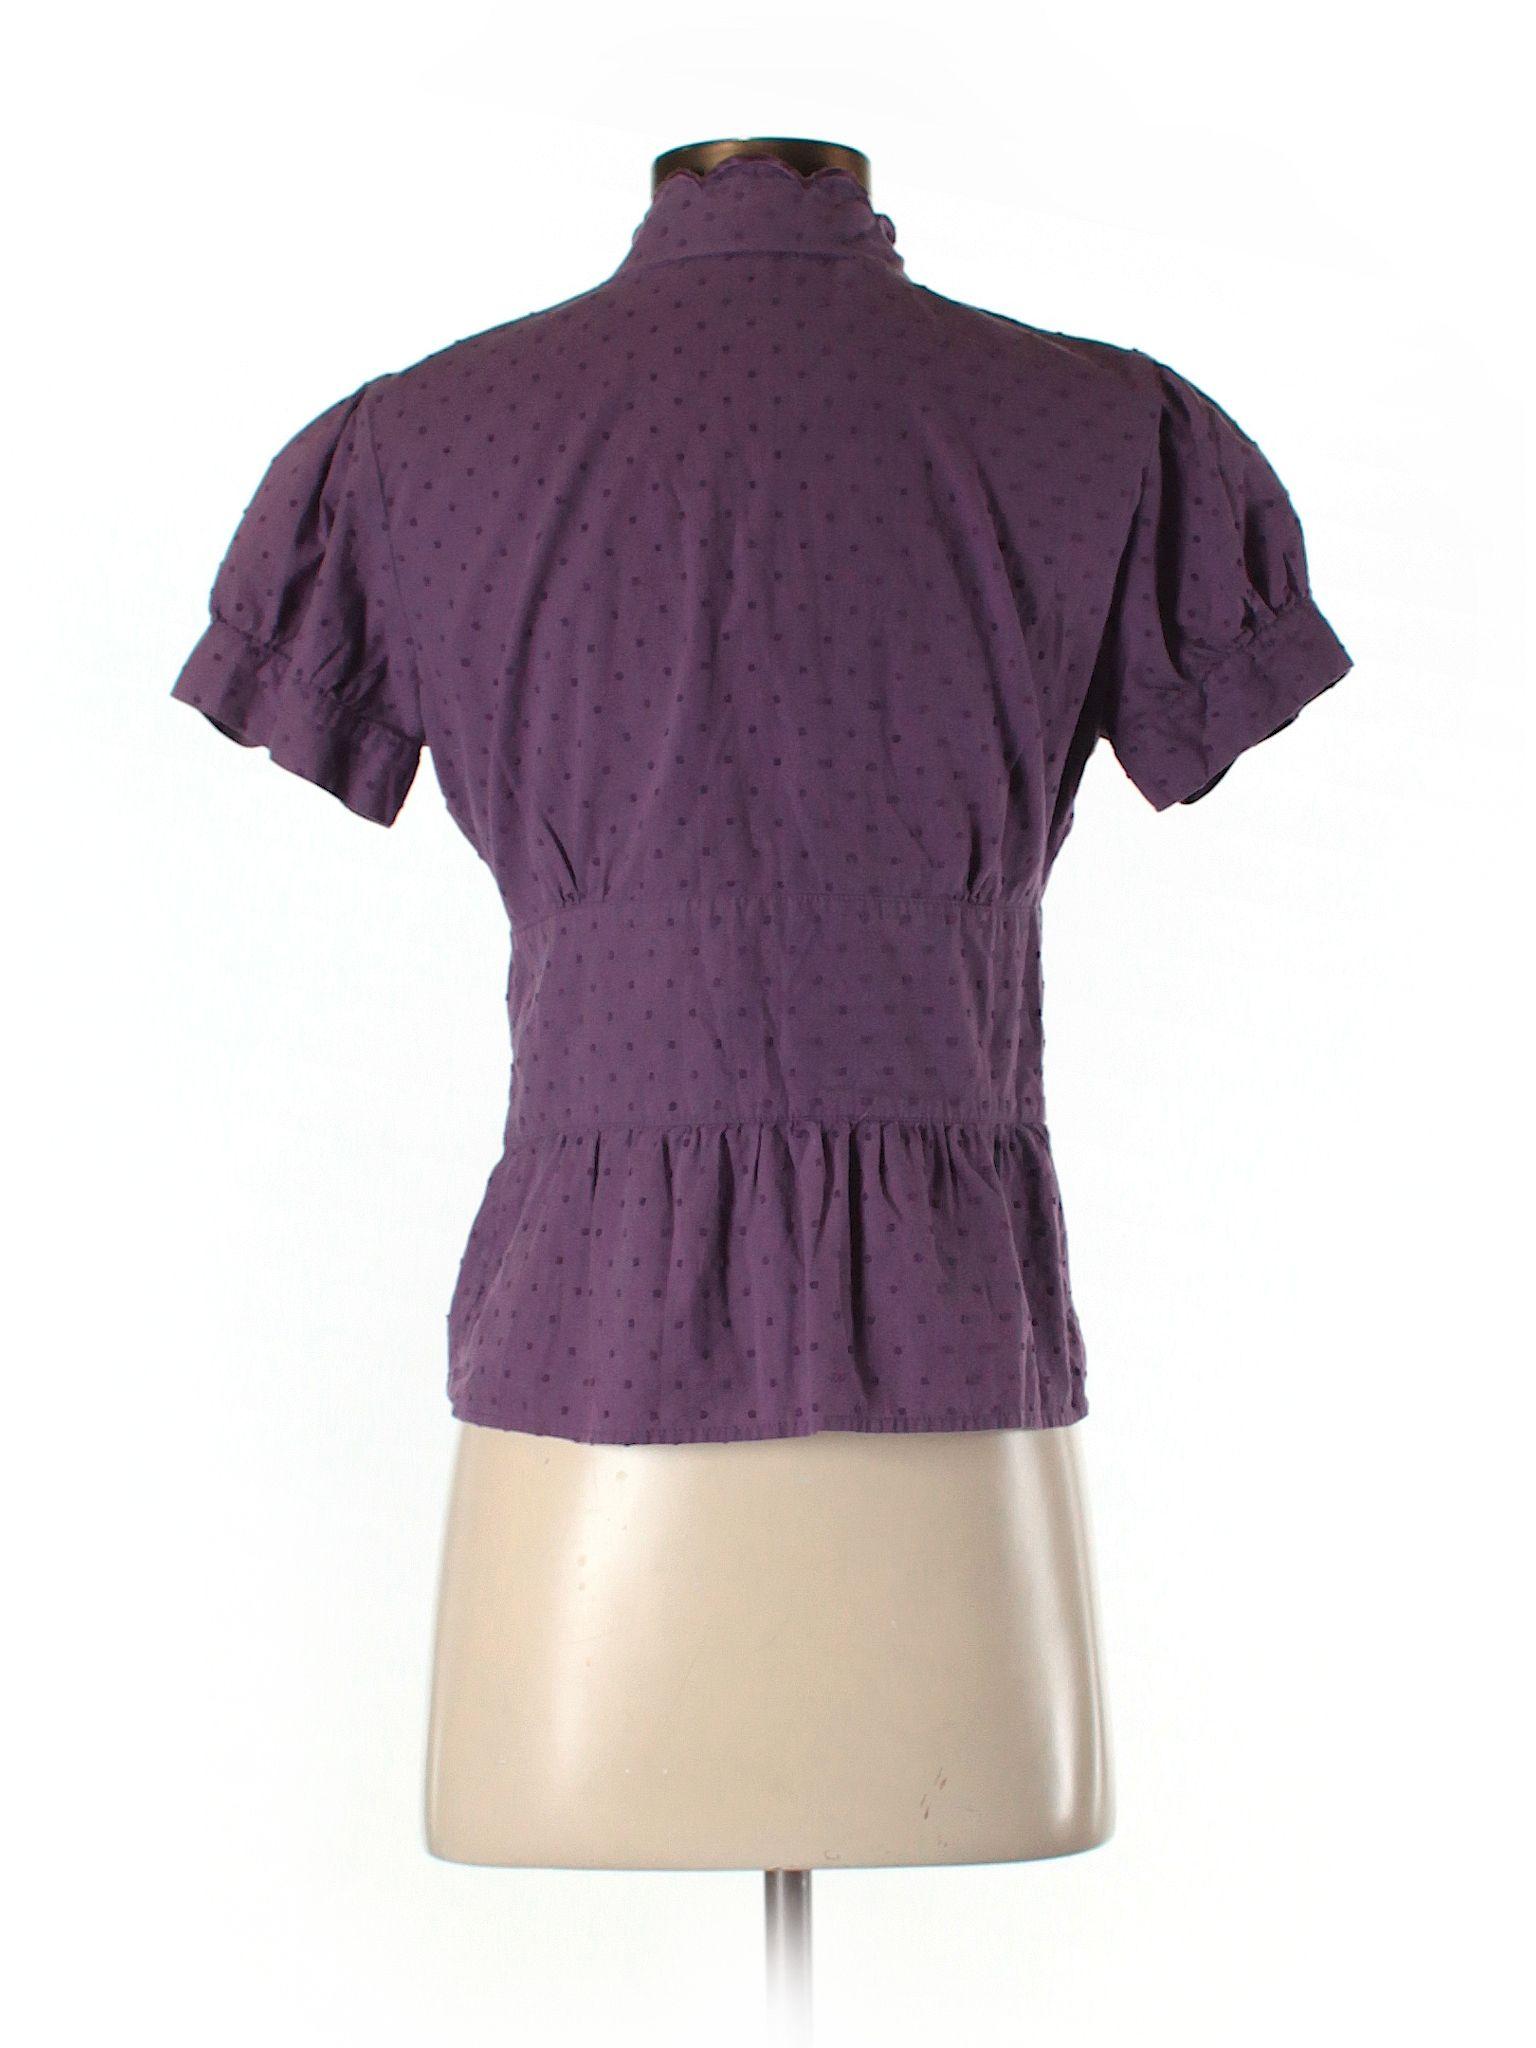 Isaac Mizrahi for Tar Short Sleeve Button Down Shirt Purple